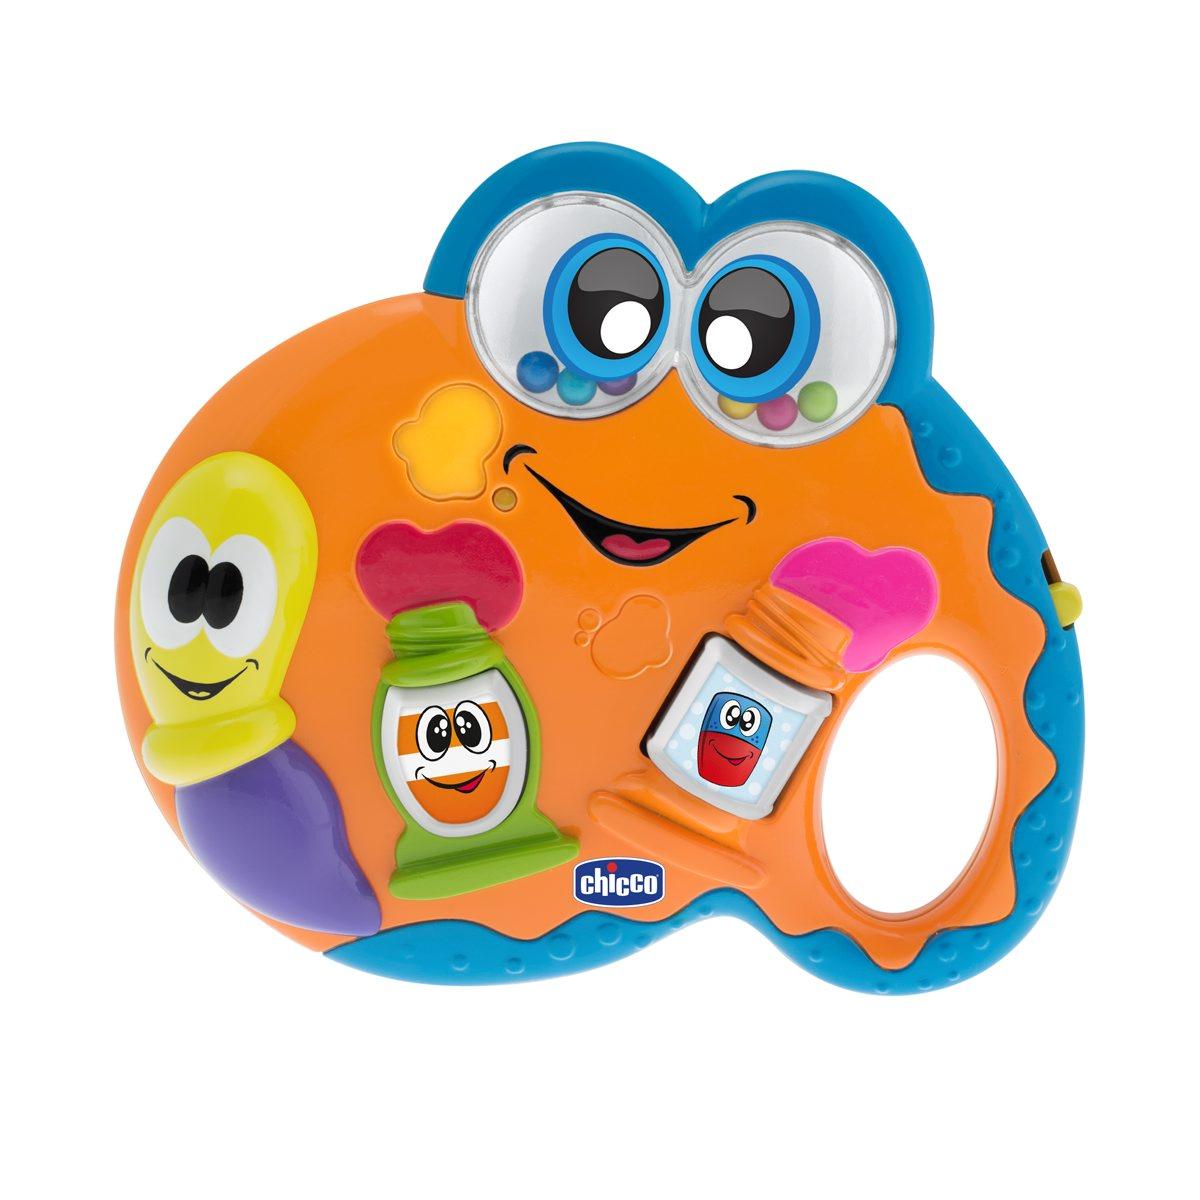 Chicco Музыкальная игрушка Палитра lilliputiens курочка офелия музыкальная игрушка